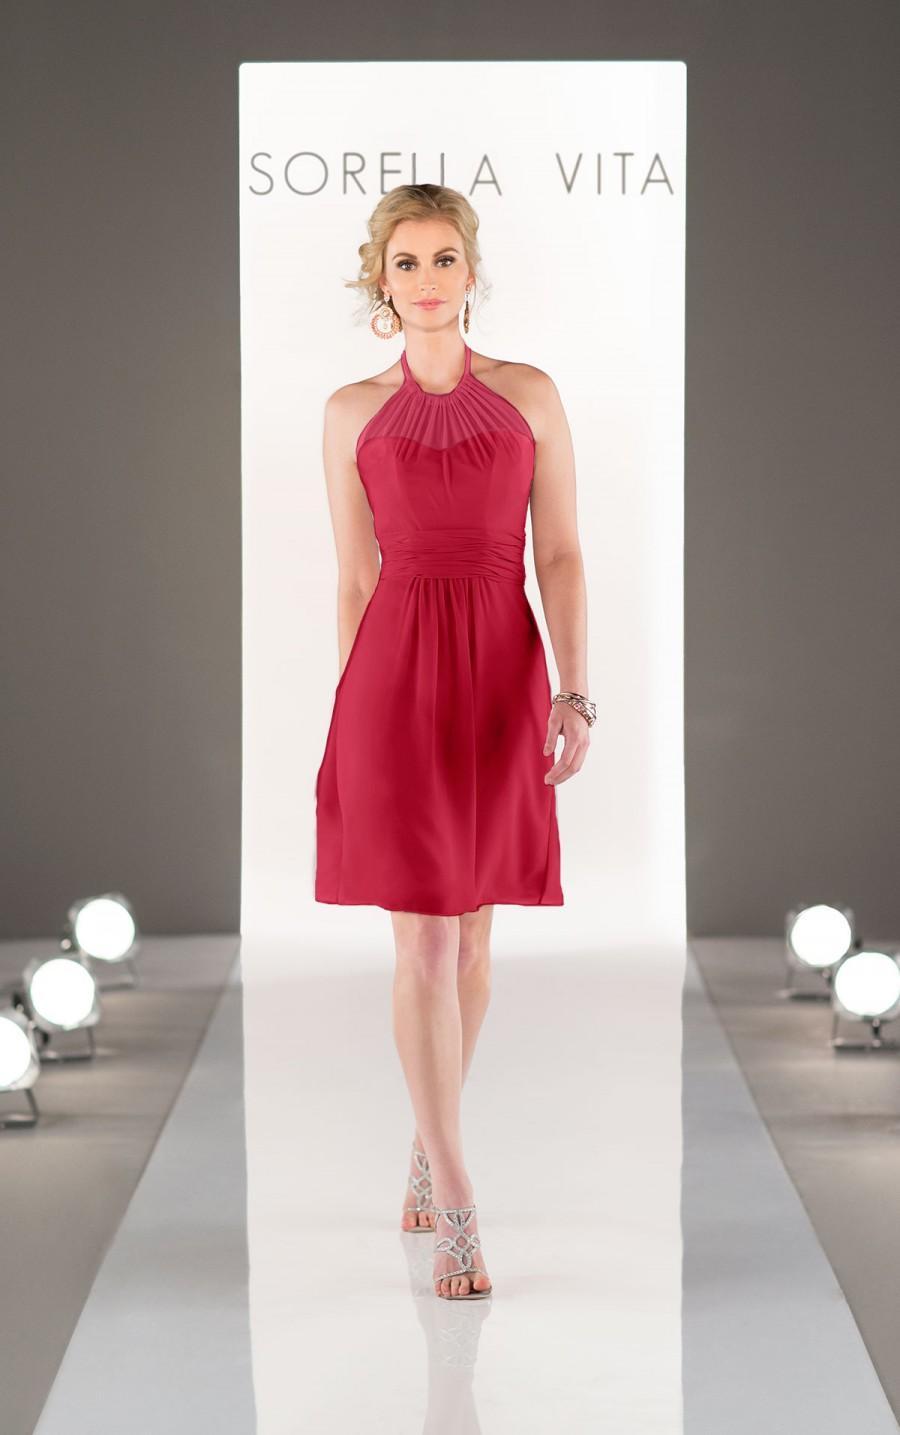 Wedding - Sorella Vita Chiffon Bridesmaid Dress Style 8647